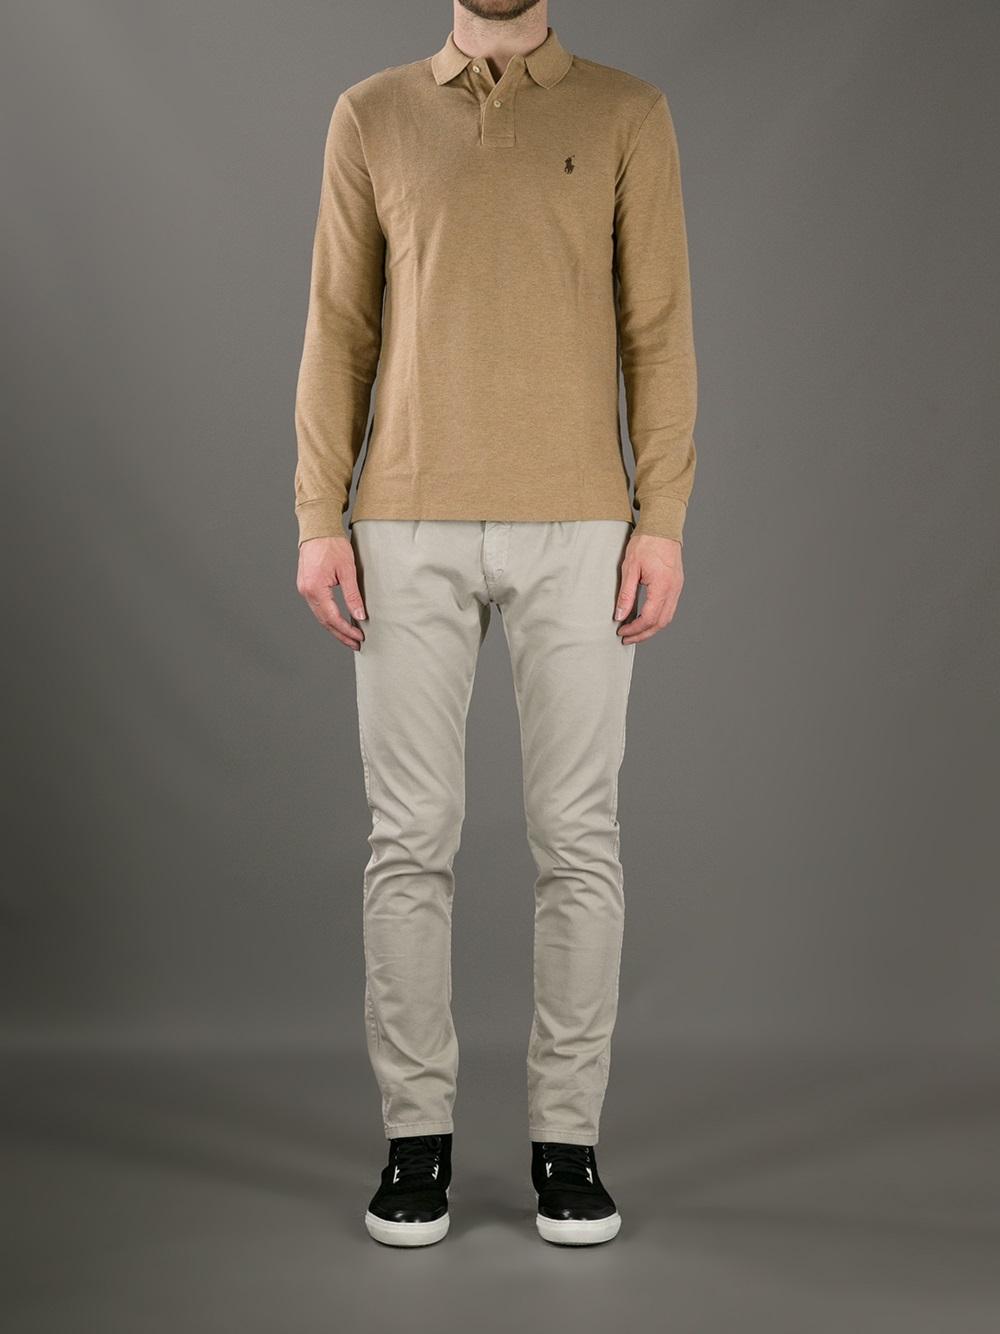 Lyst Polo Ralph Lauren Long Sleeve Polo Shirt In Brown